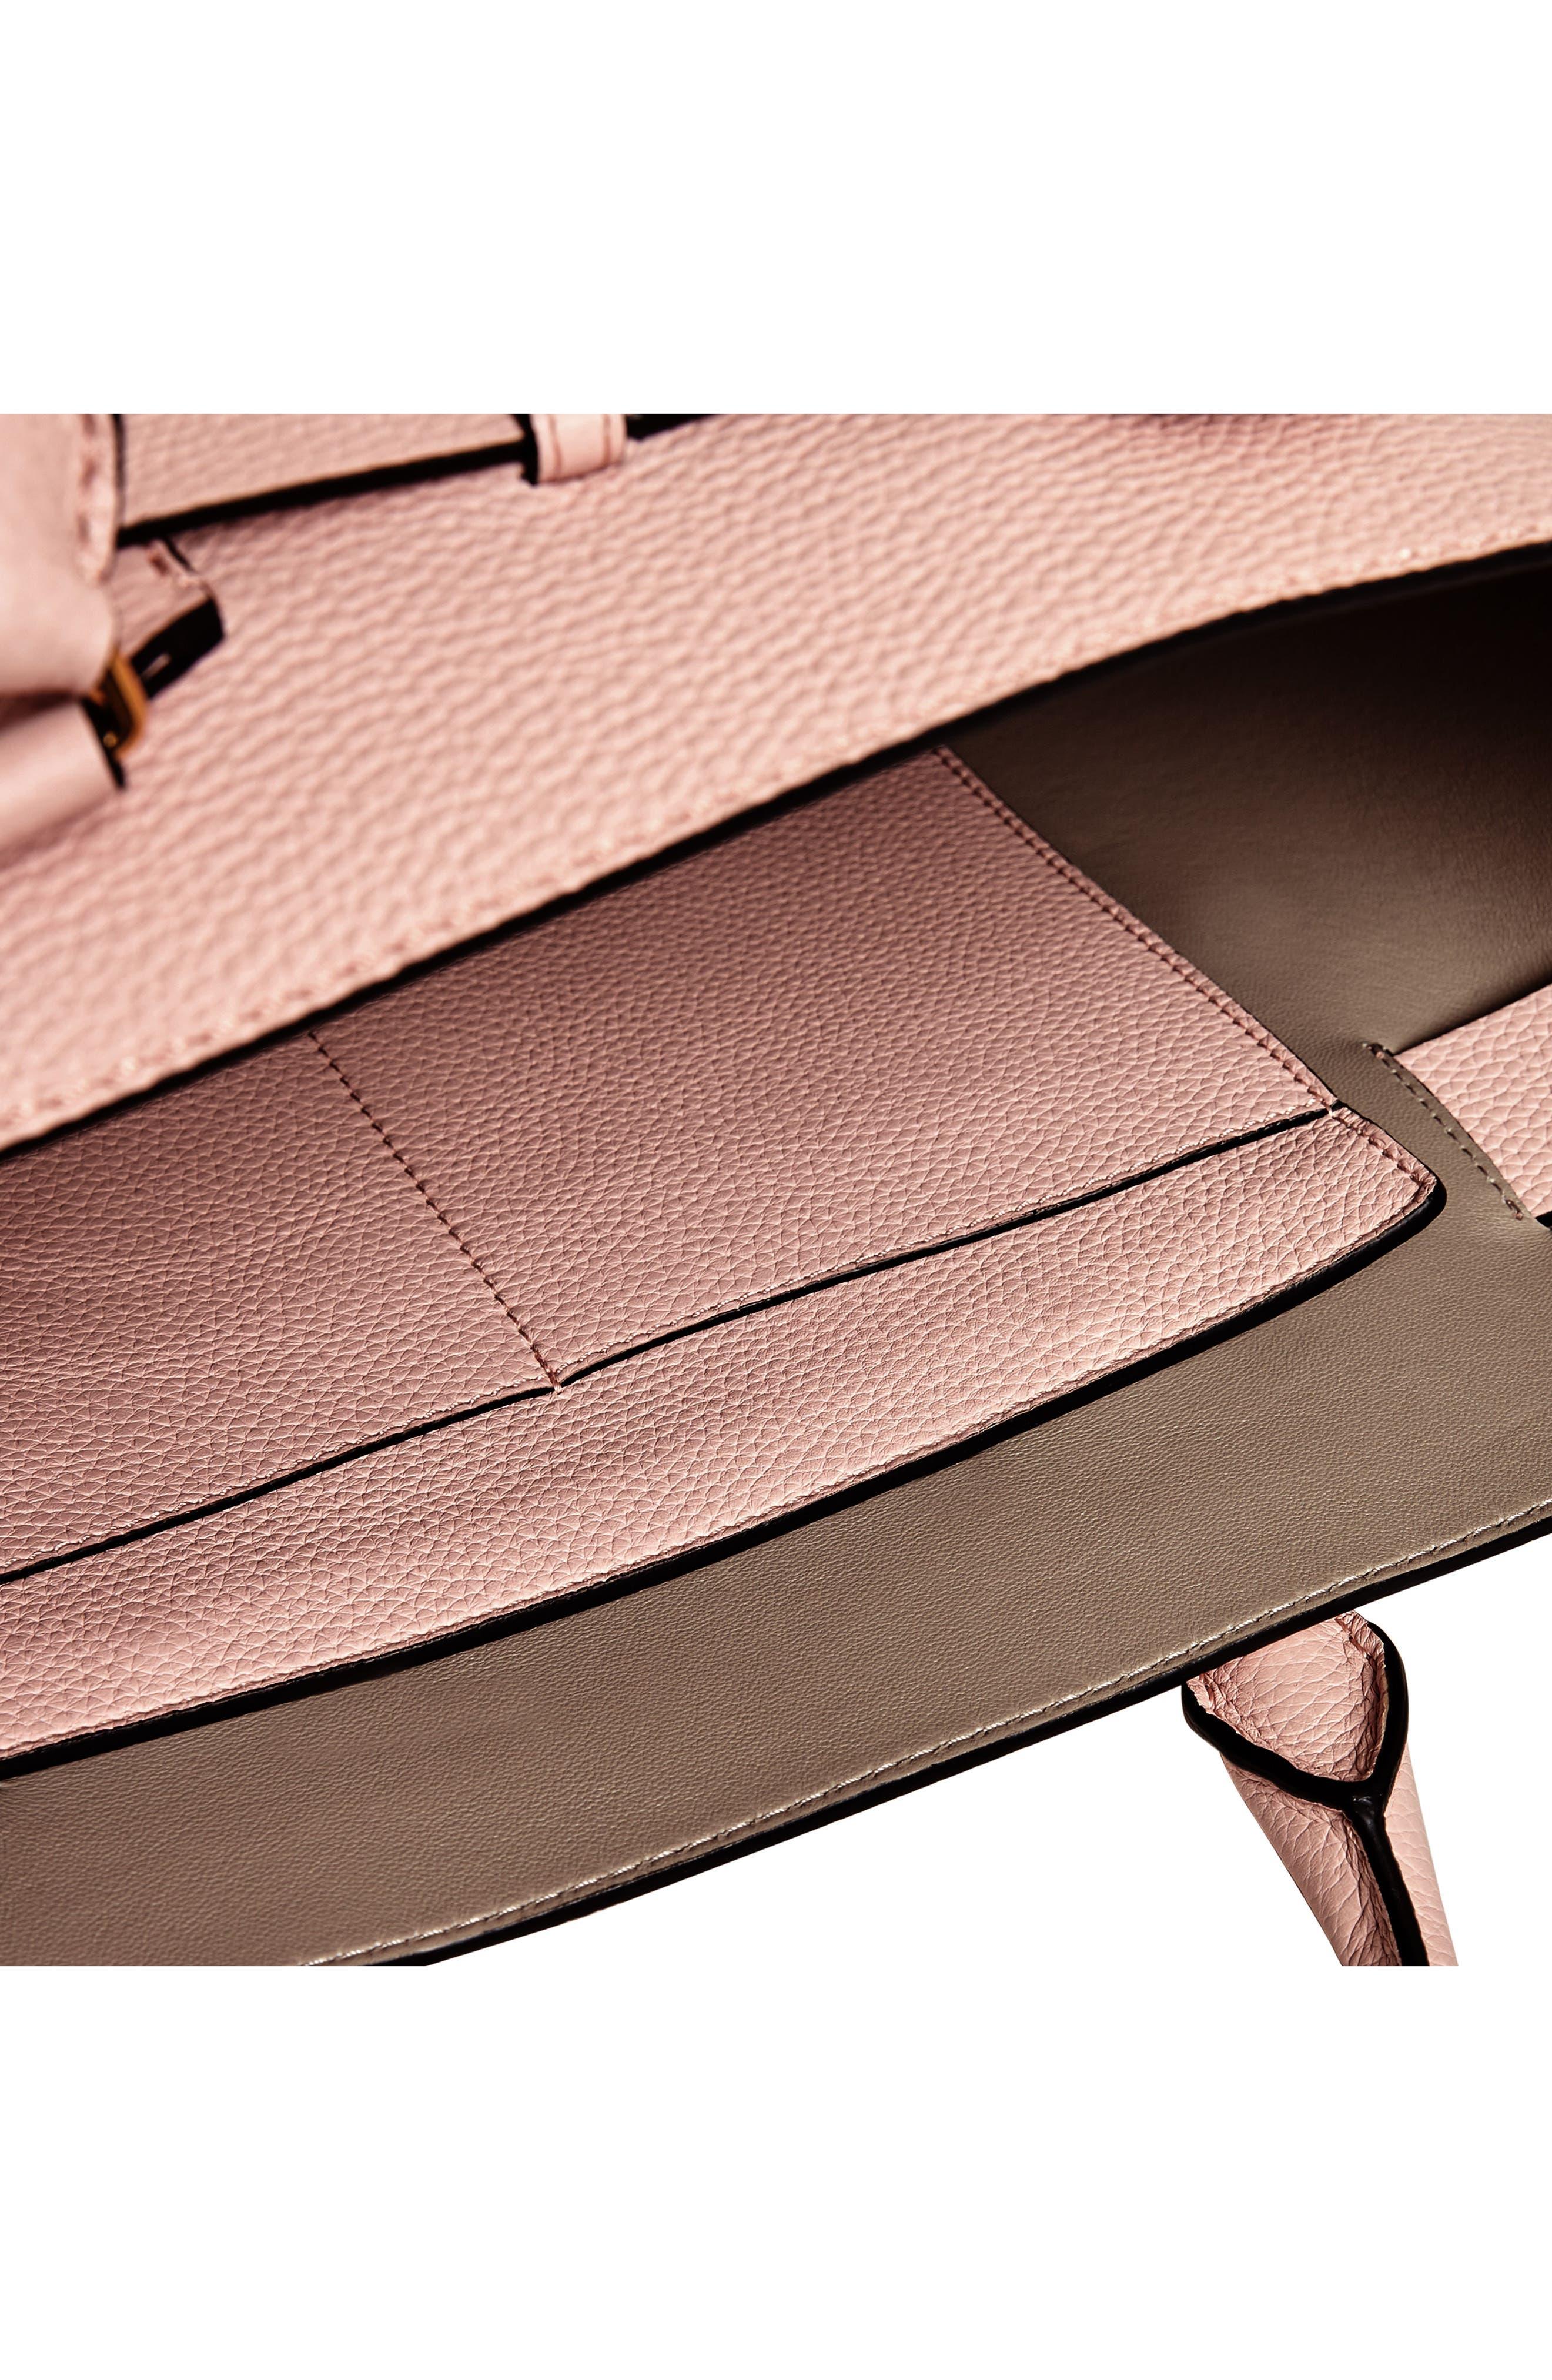 Medium Belt Bag Leather Tote,                             Alternate thumbnail 5, color,                             PALE ASH ROSE